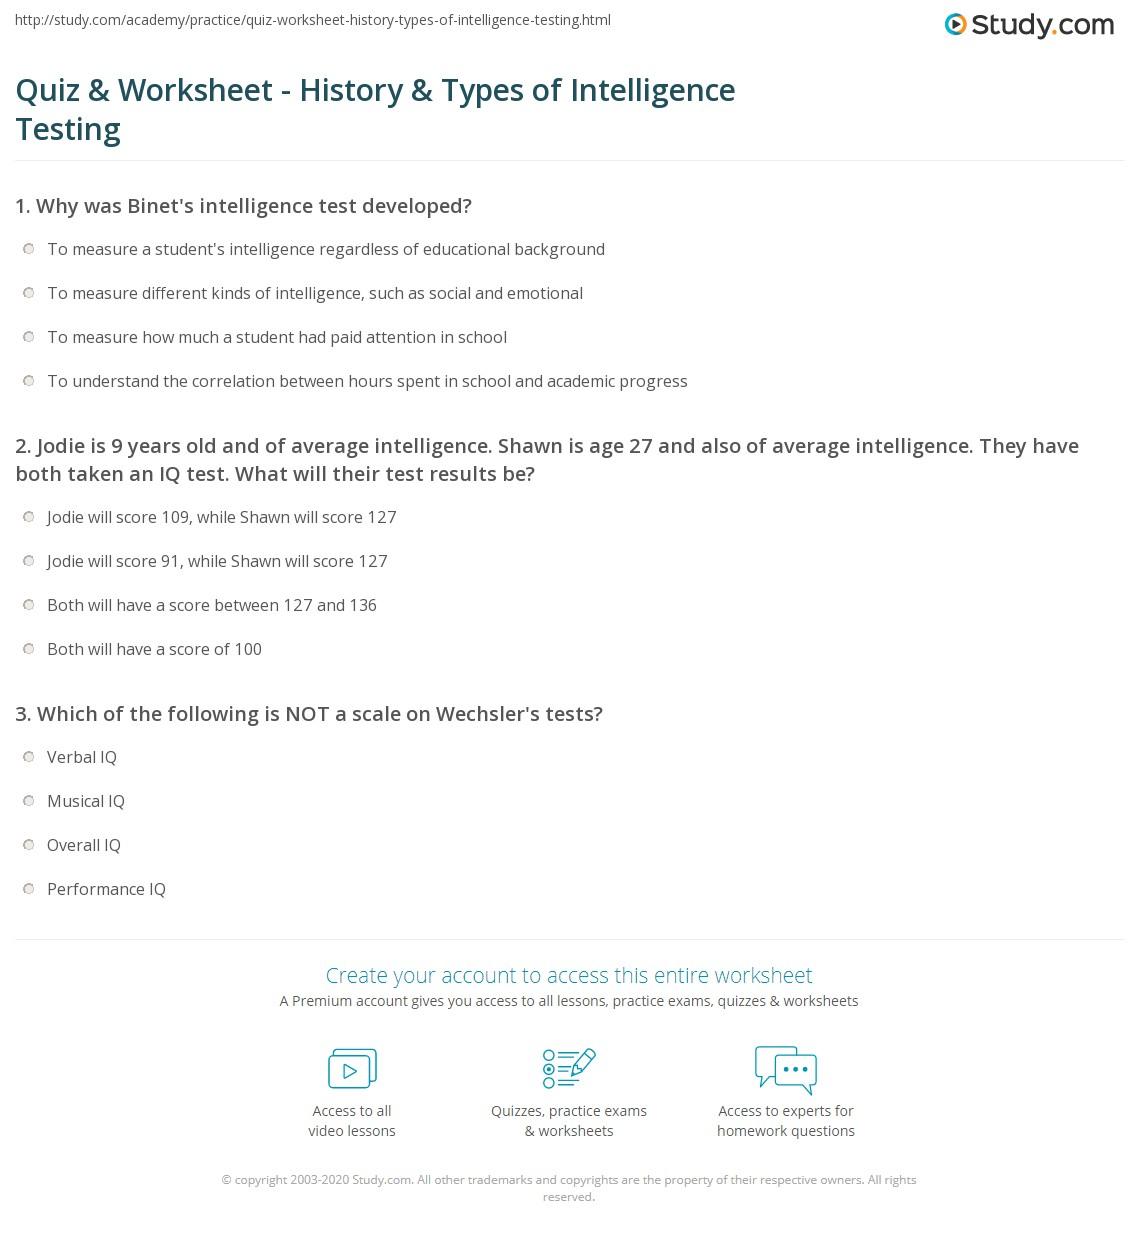 Quiz & Worksheet - History & Types of Intelligence Testing